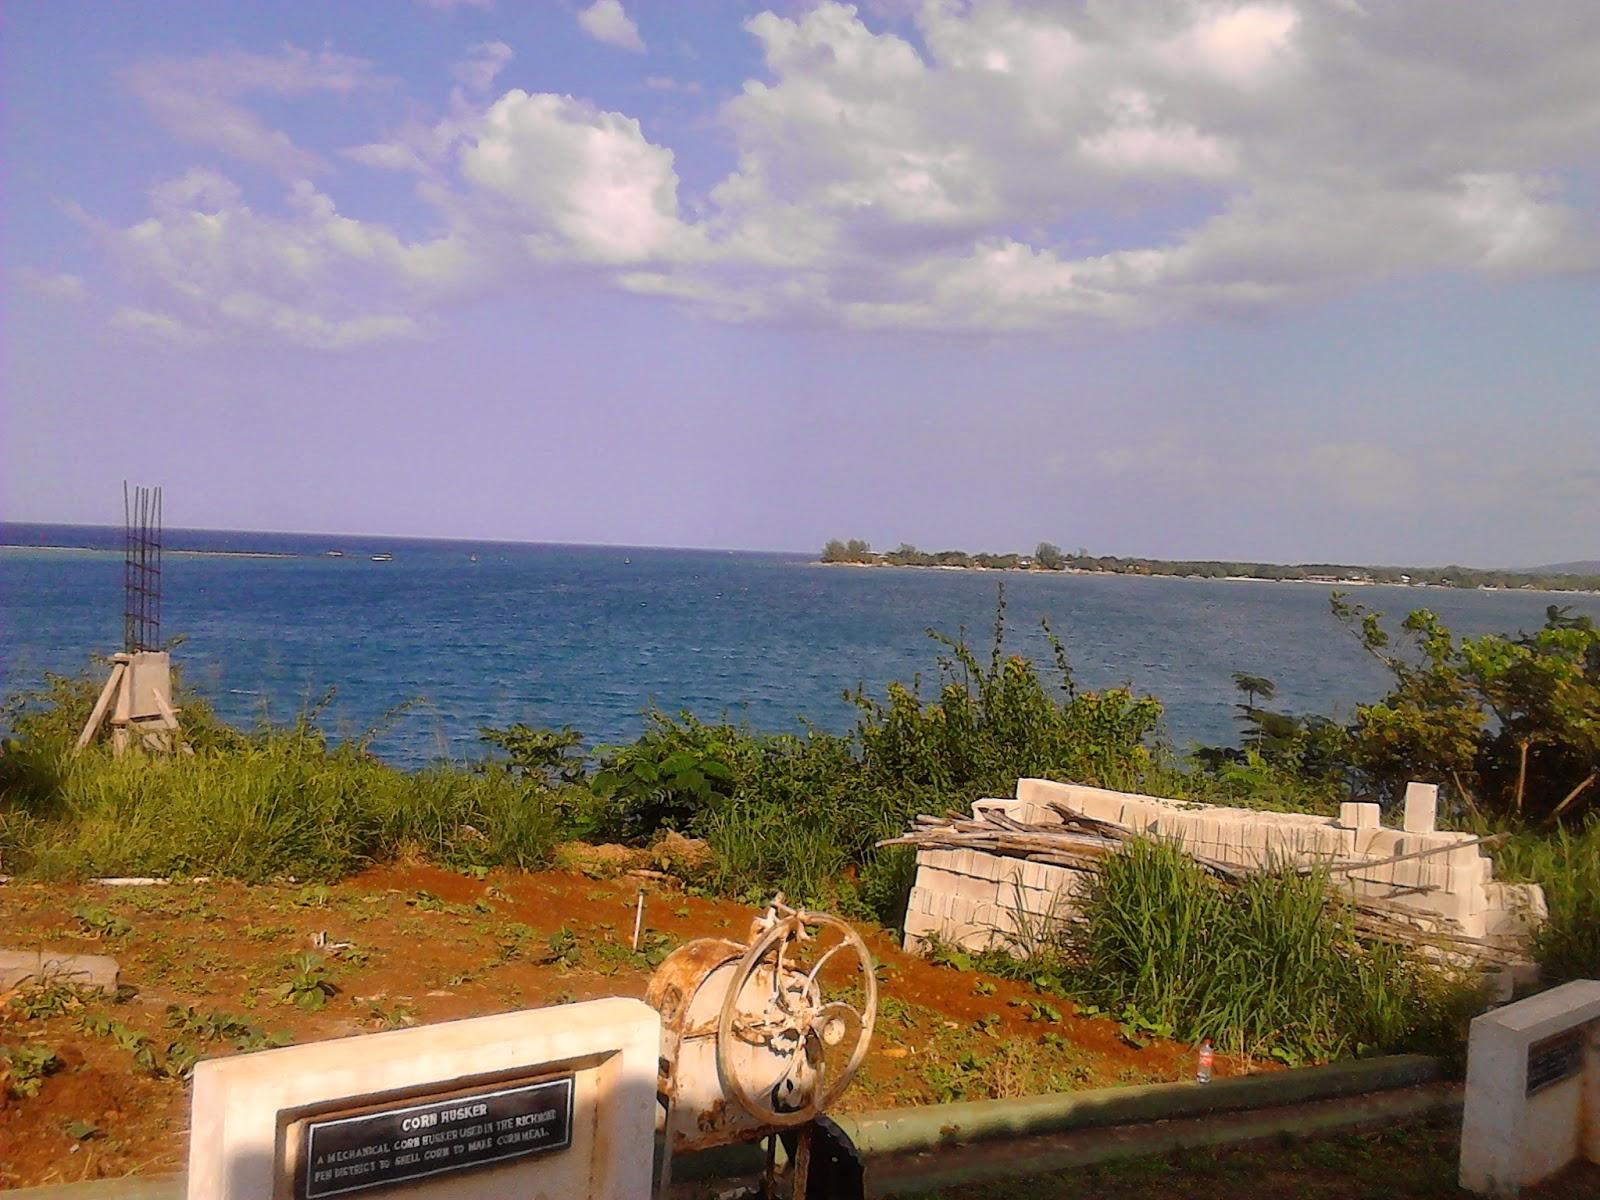 http://lionessrebirthorg.blogspot.com/